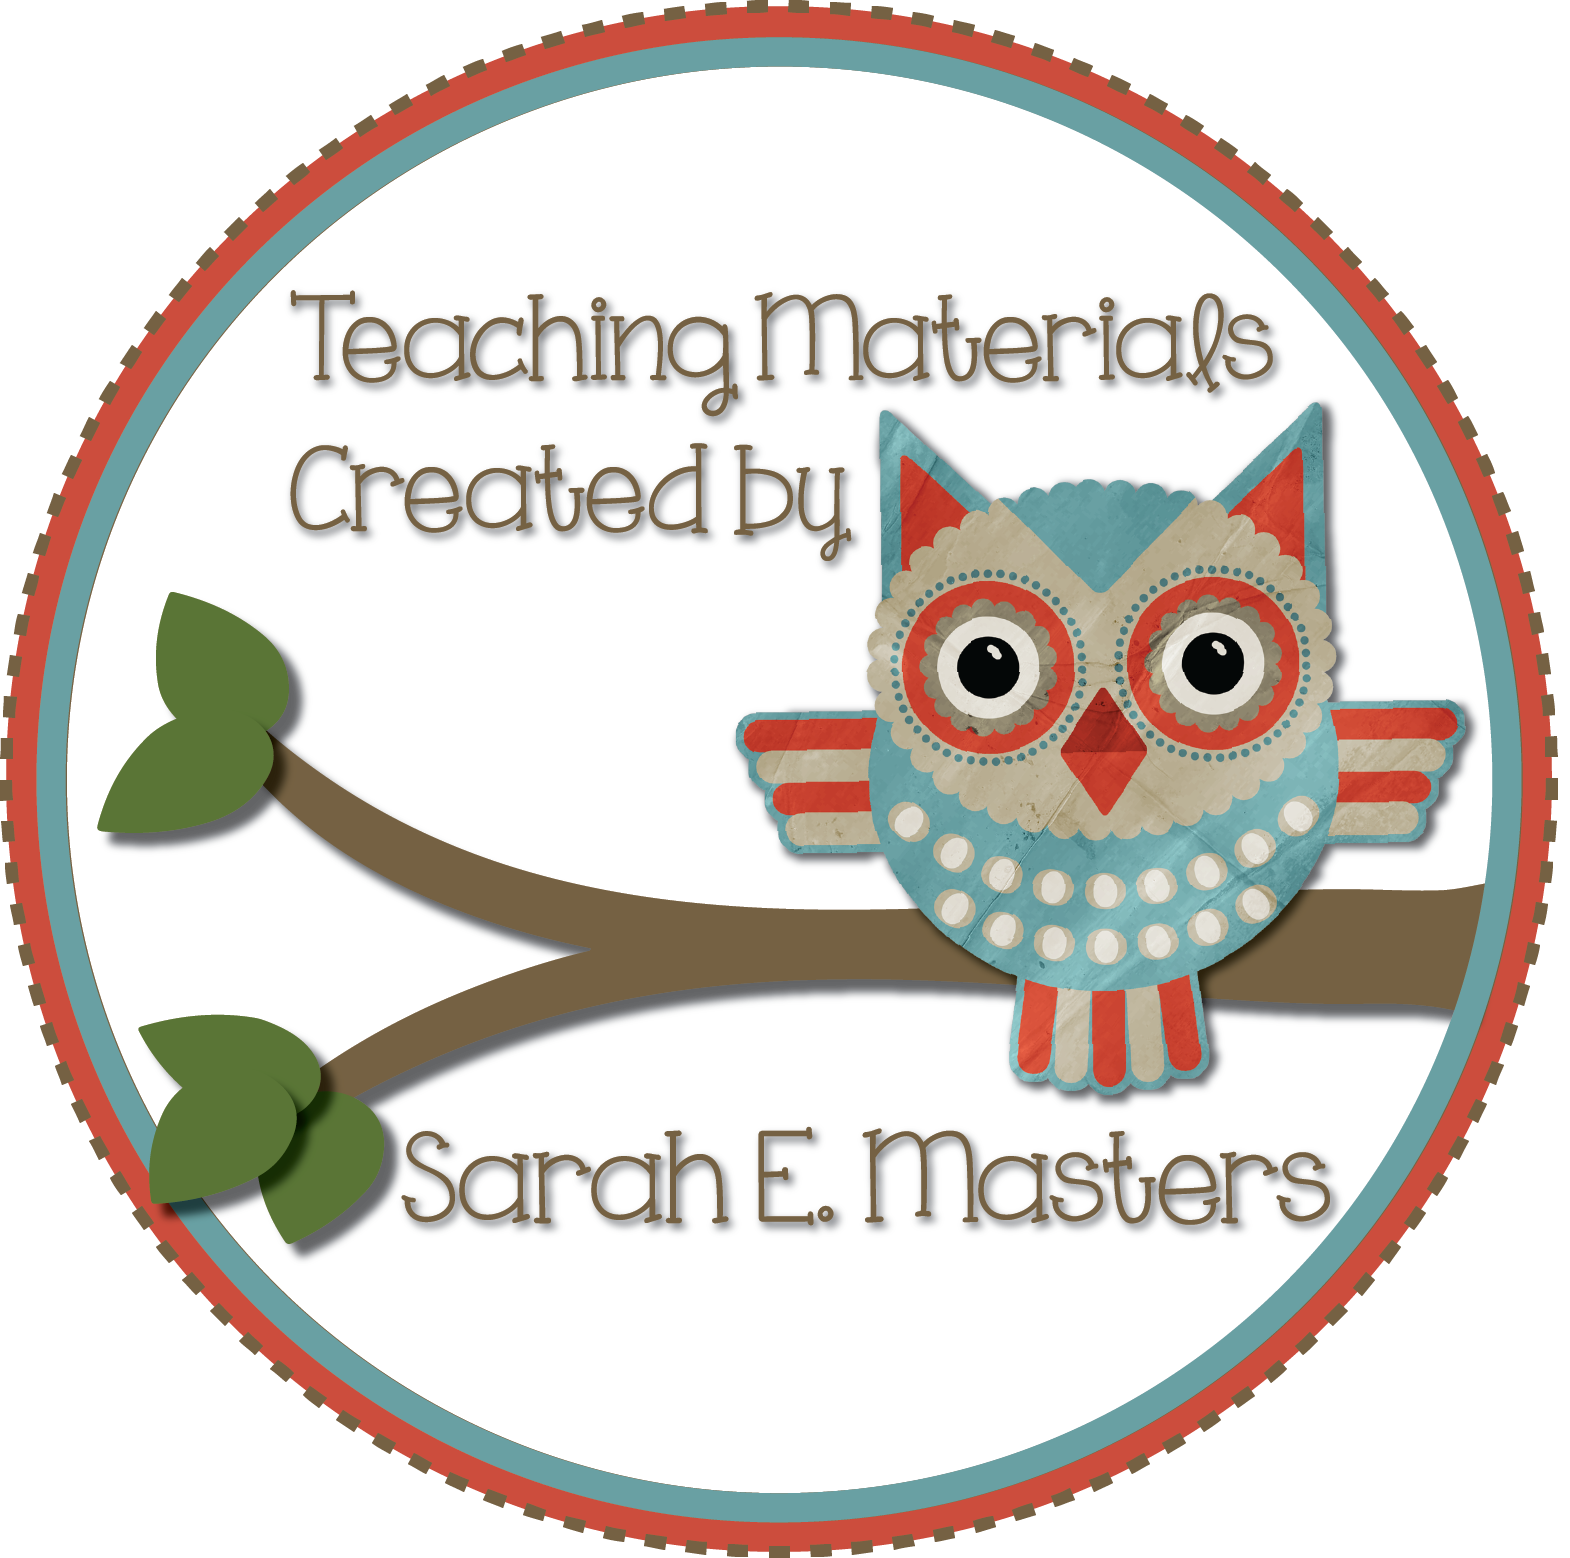 http://www.teacherspayteachers.com/Store/Sarah-E-Masters